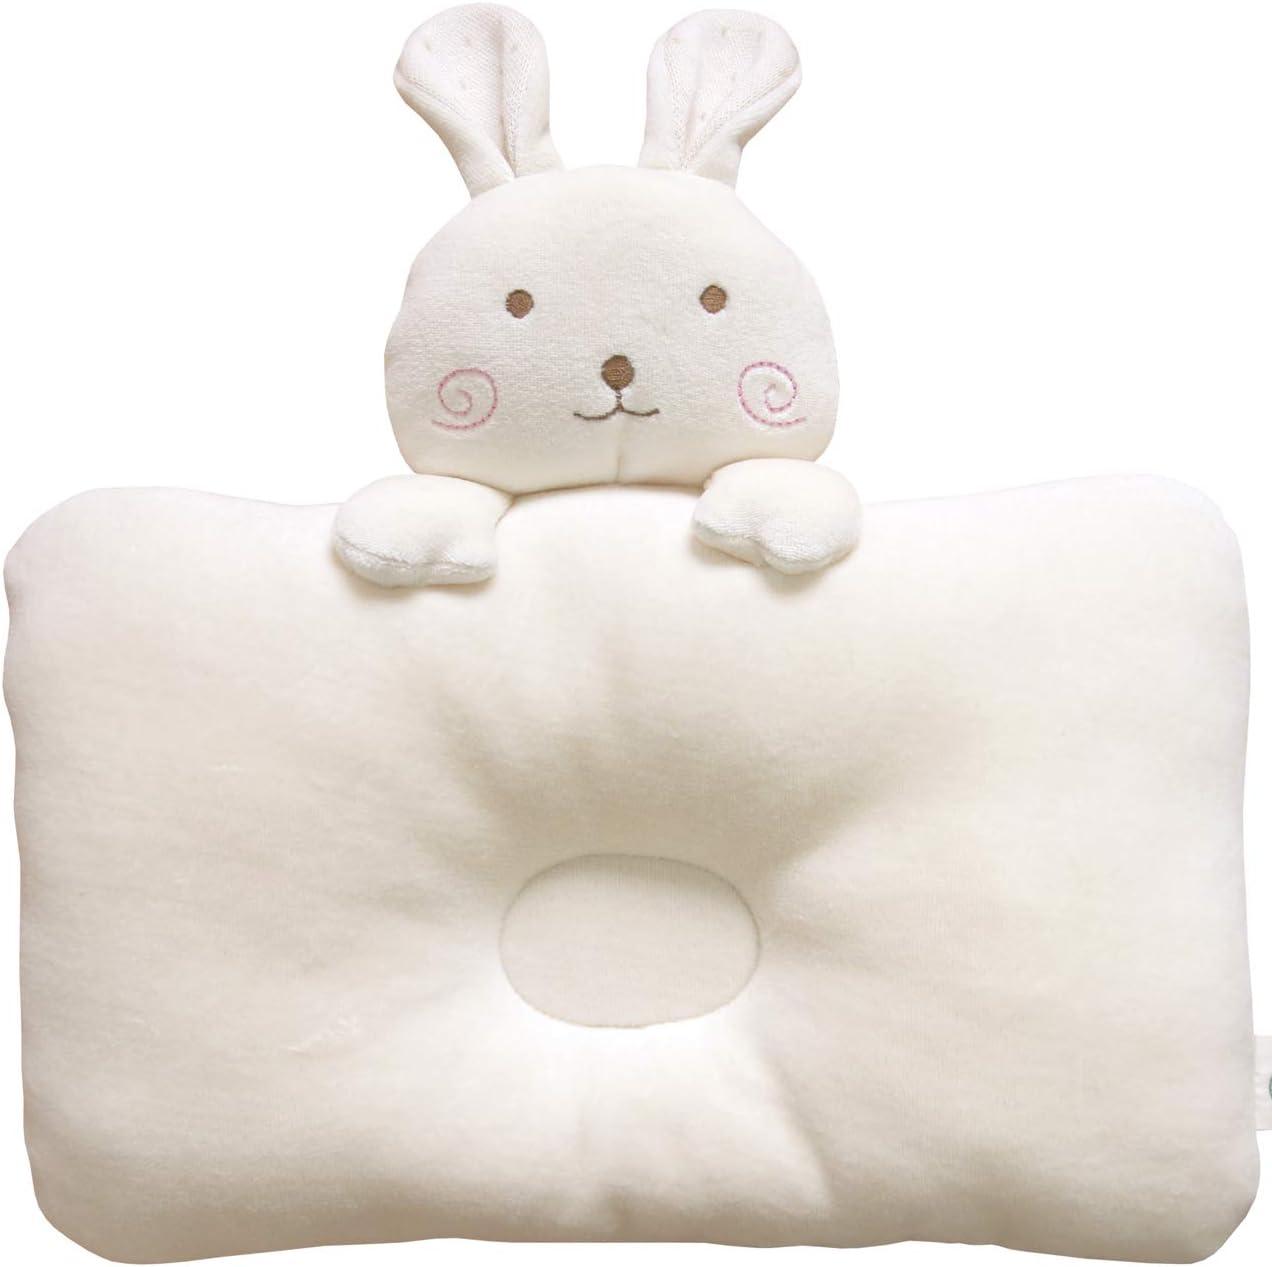 John N Tree Organic Cotton Baby Protective Pillow